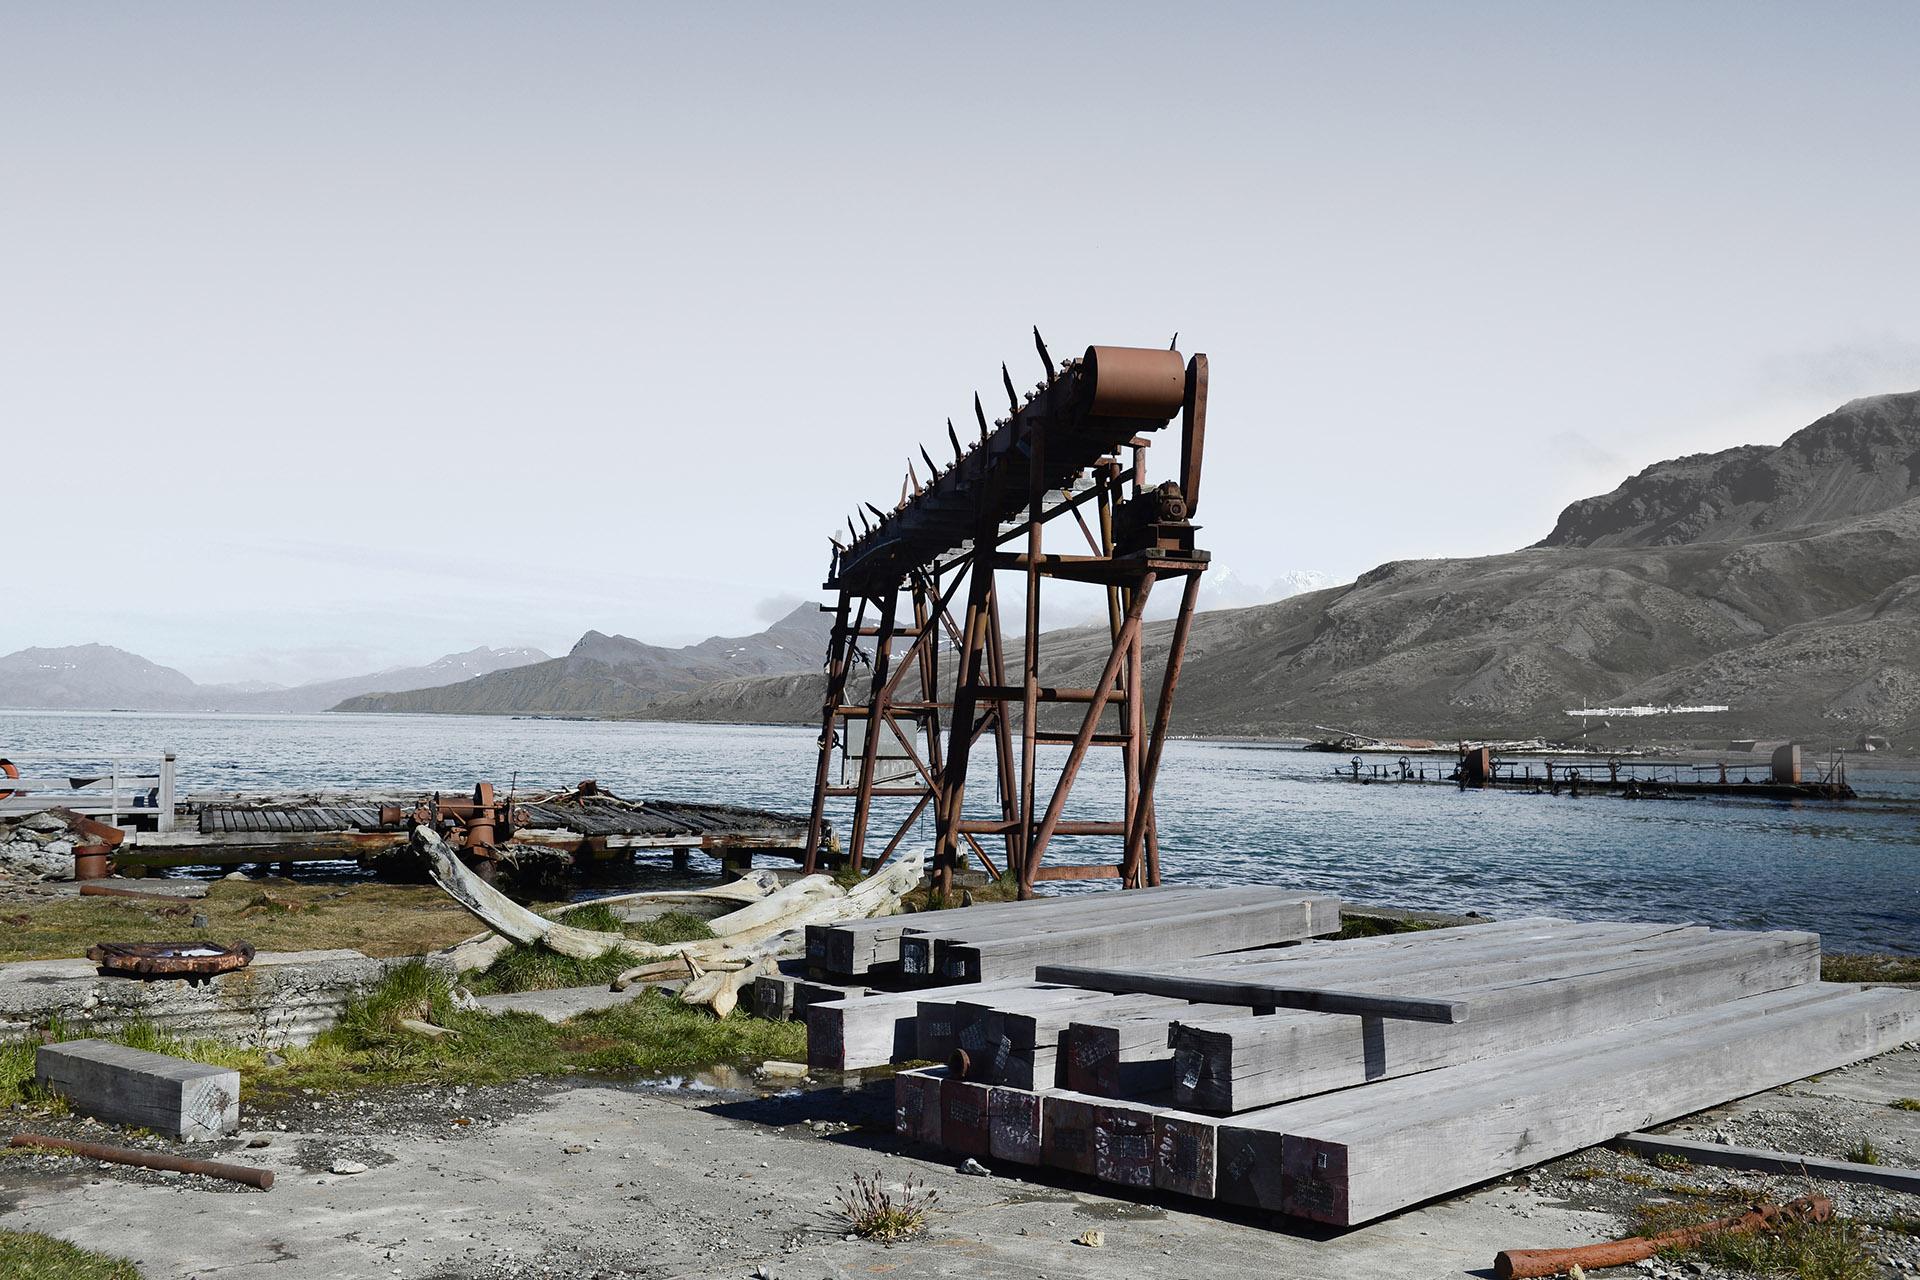 Grytviken, South Georgia<br/>Impresión digital / Inject print